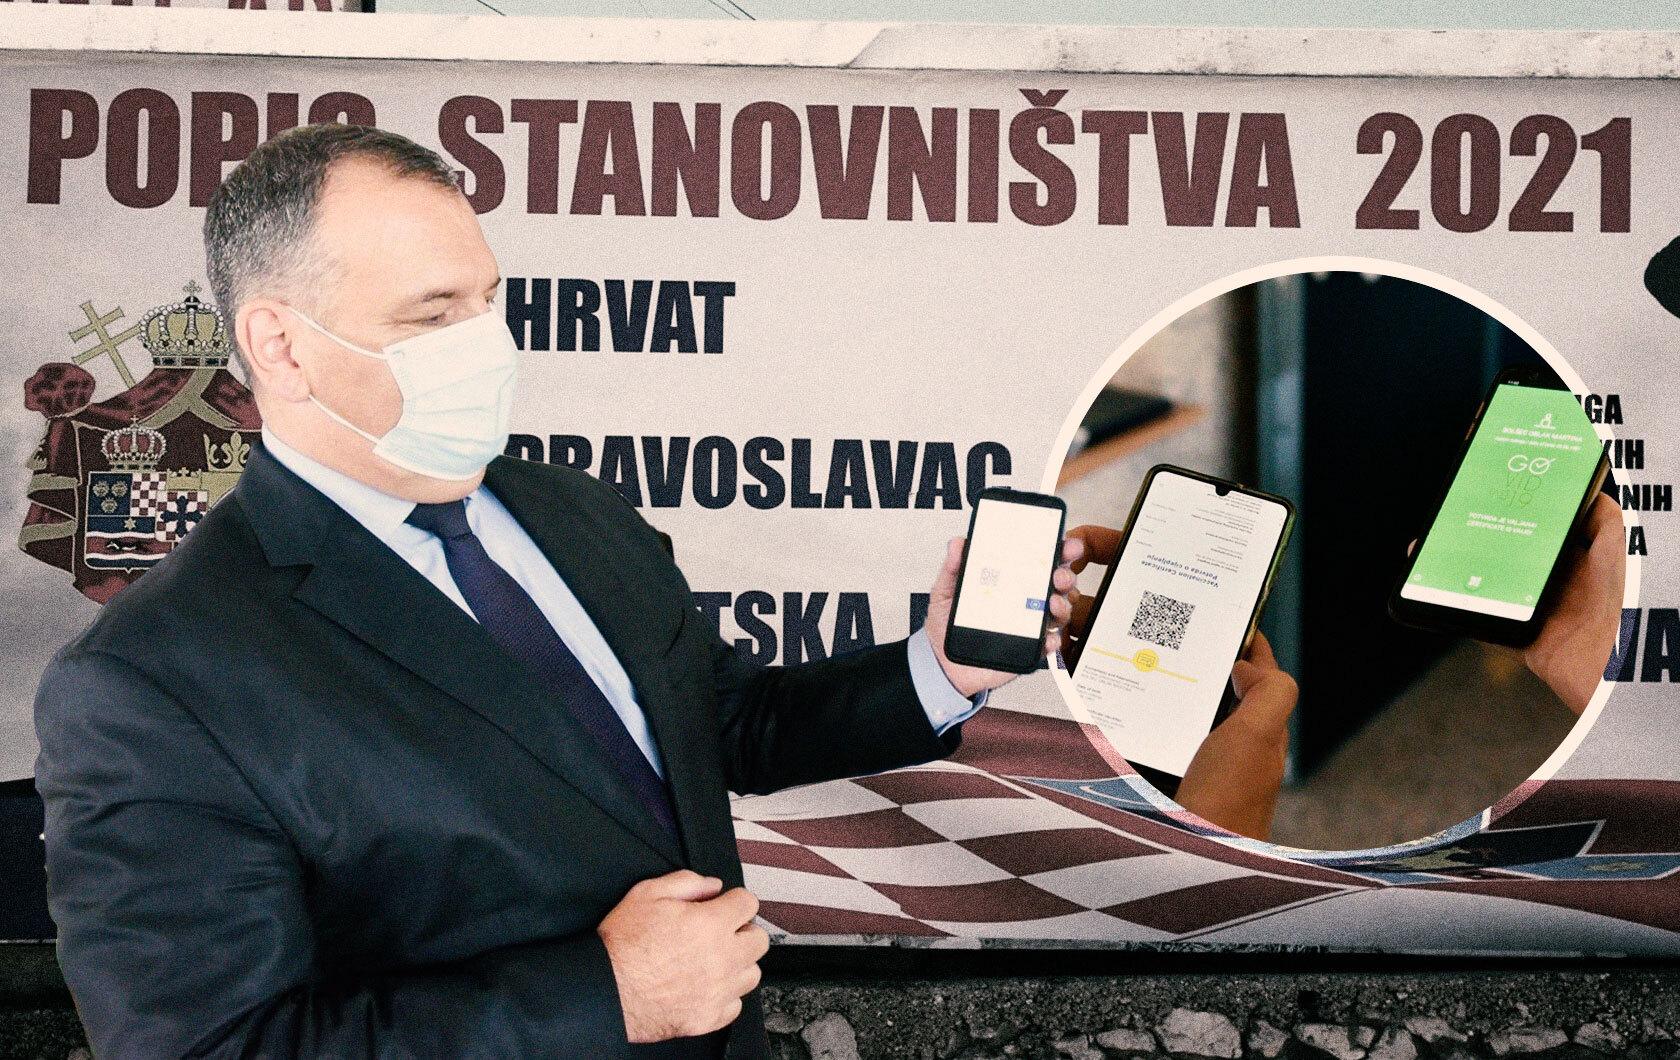 www.telegram.hr